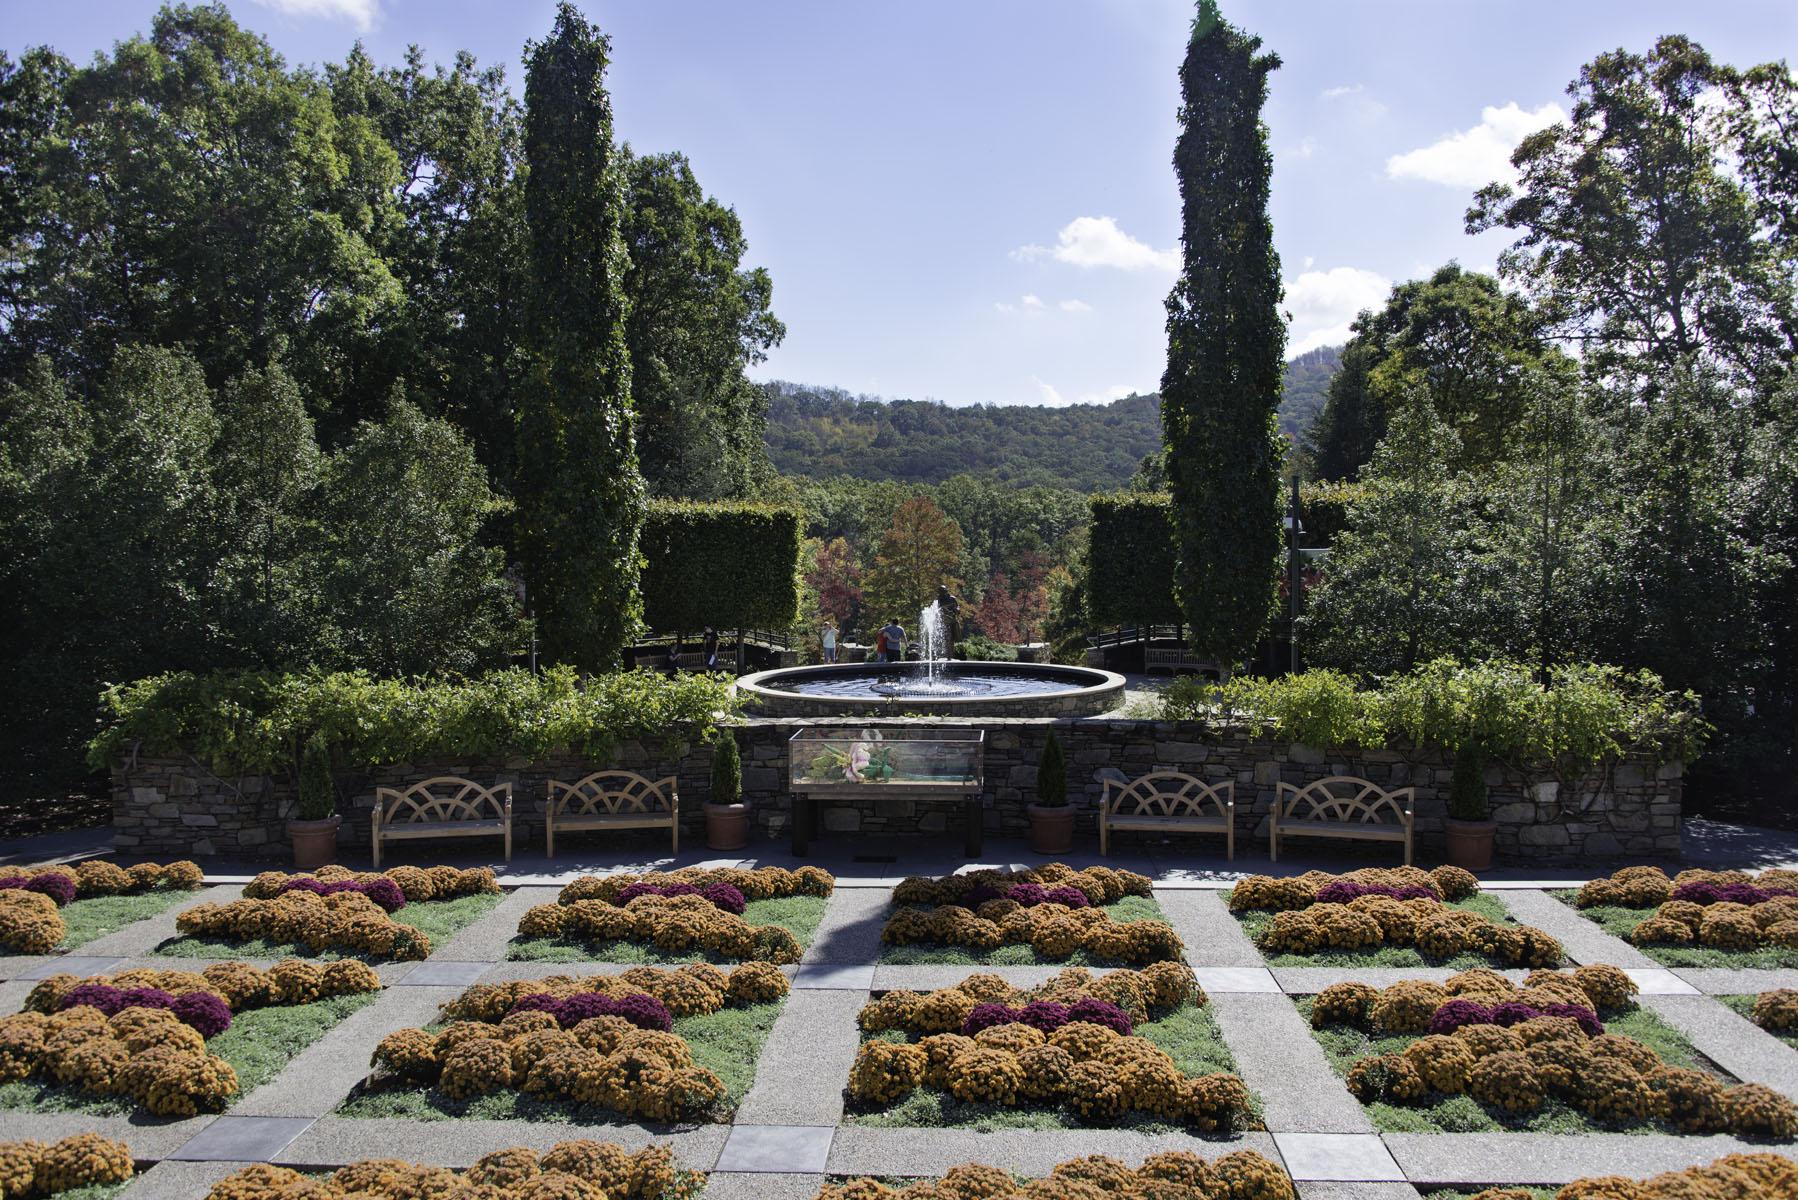 Formal Garden at the North Carolina Arboretum